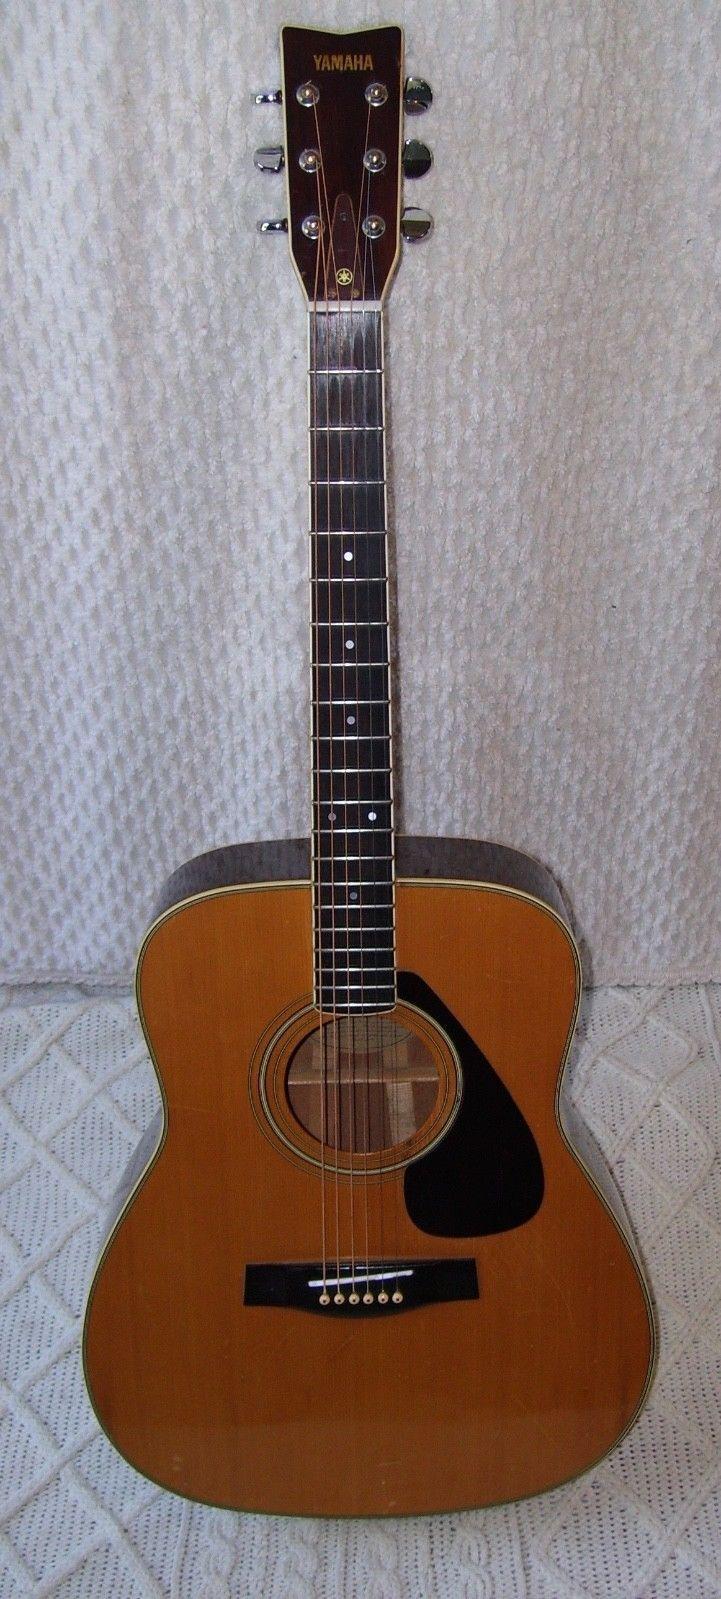 #guitar Yamaha Acoustic Guitar Vintage FG340 please retweet